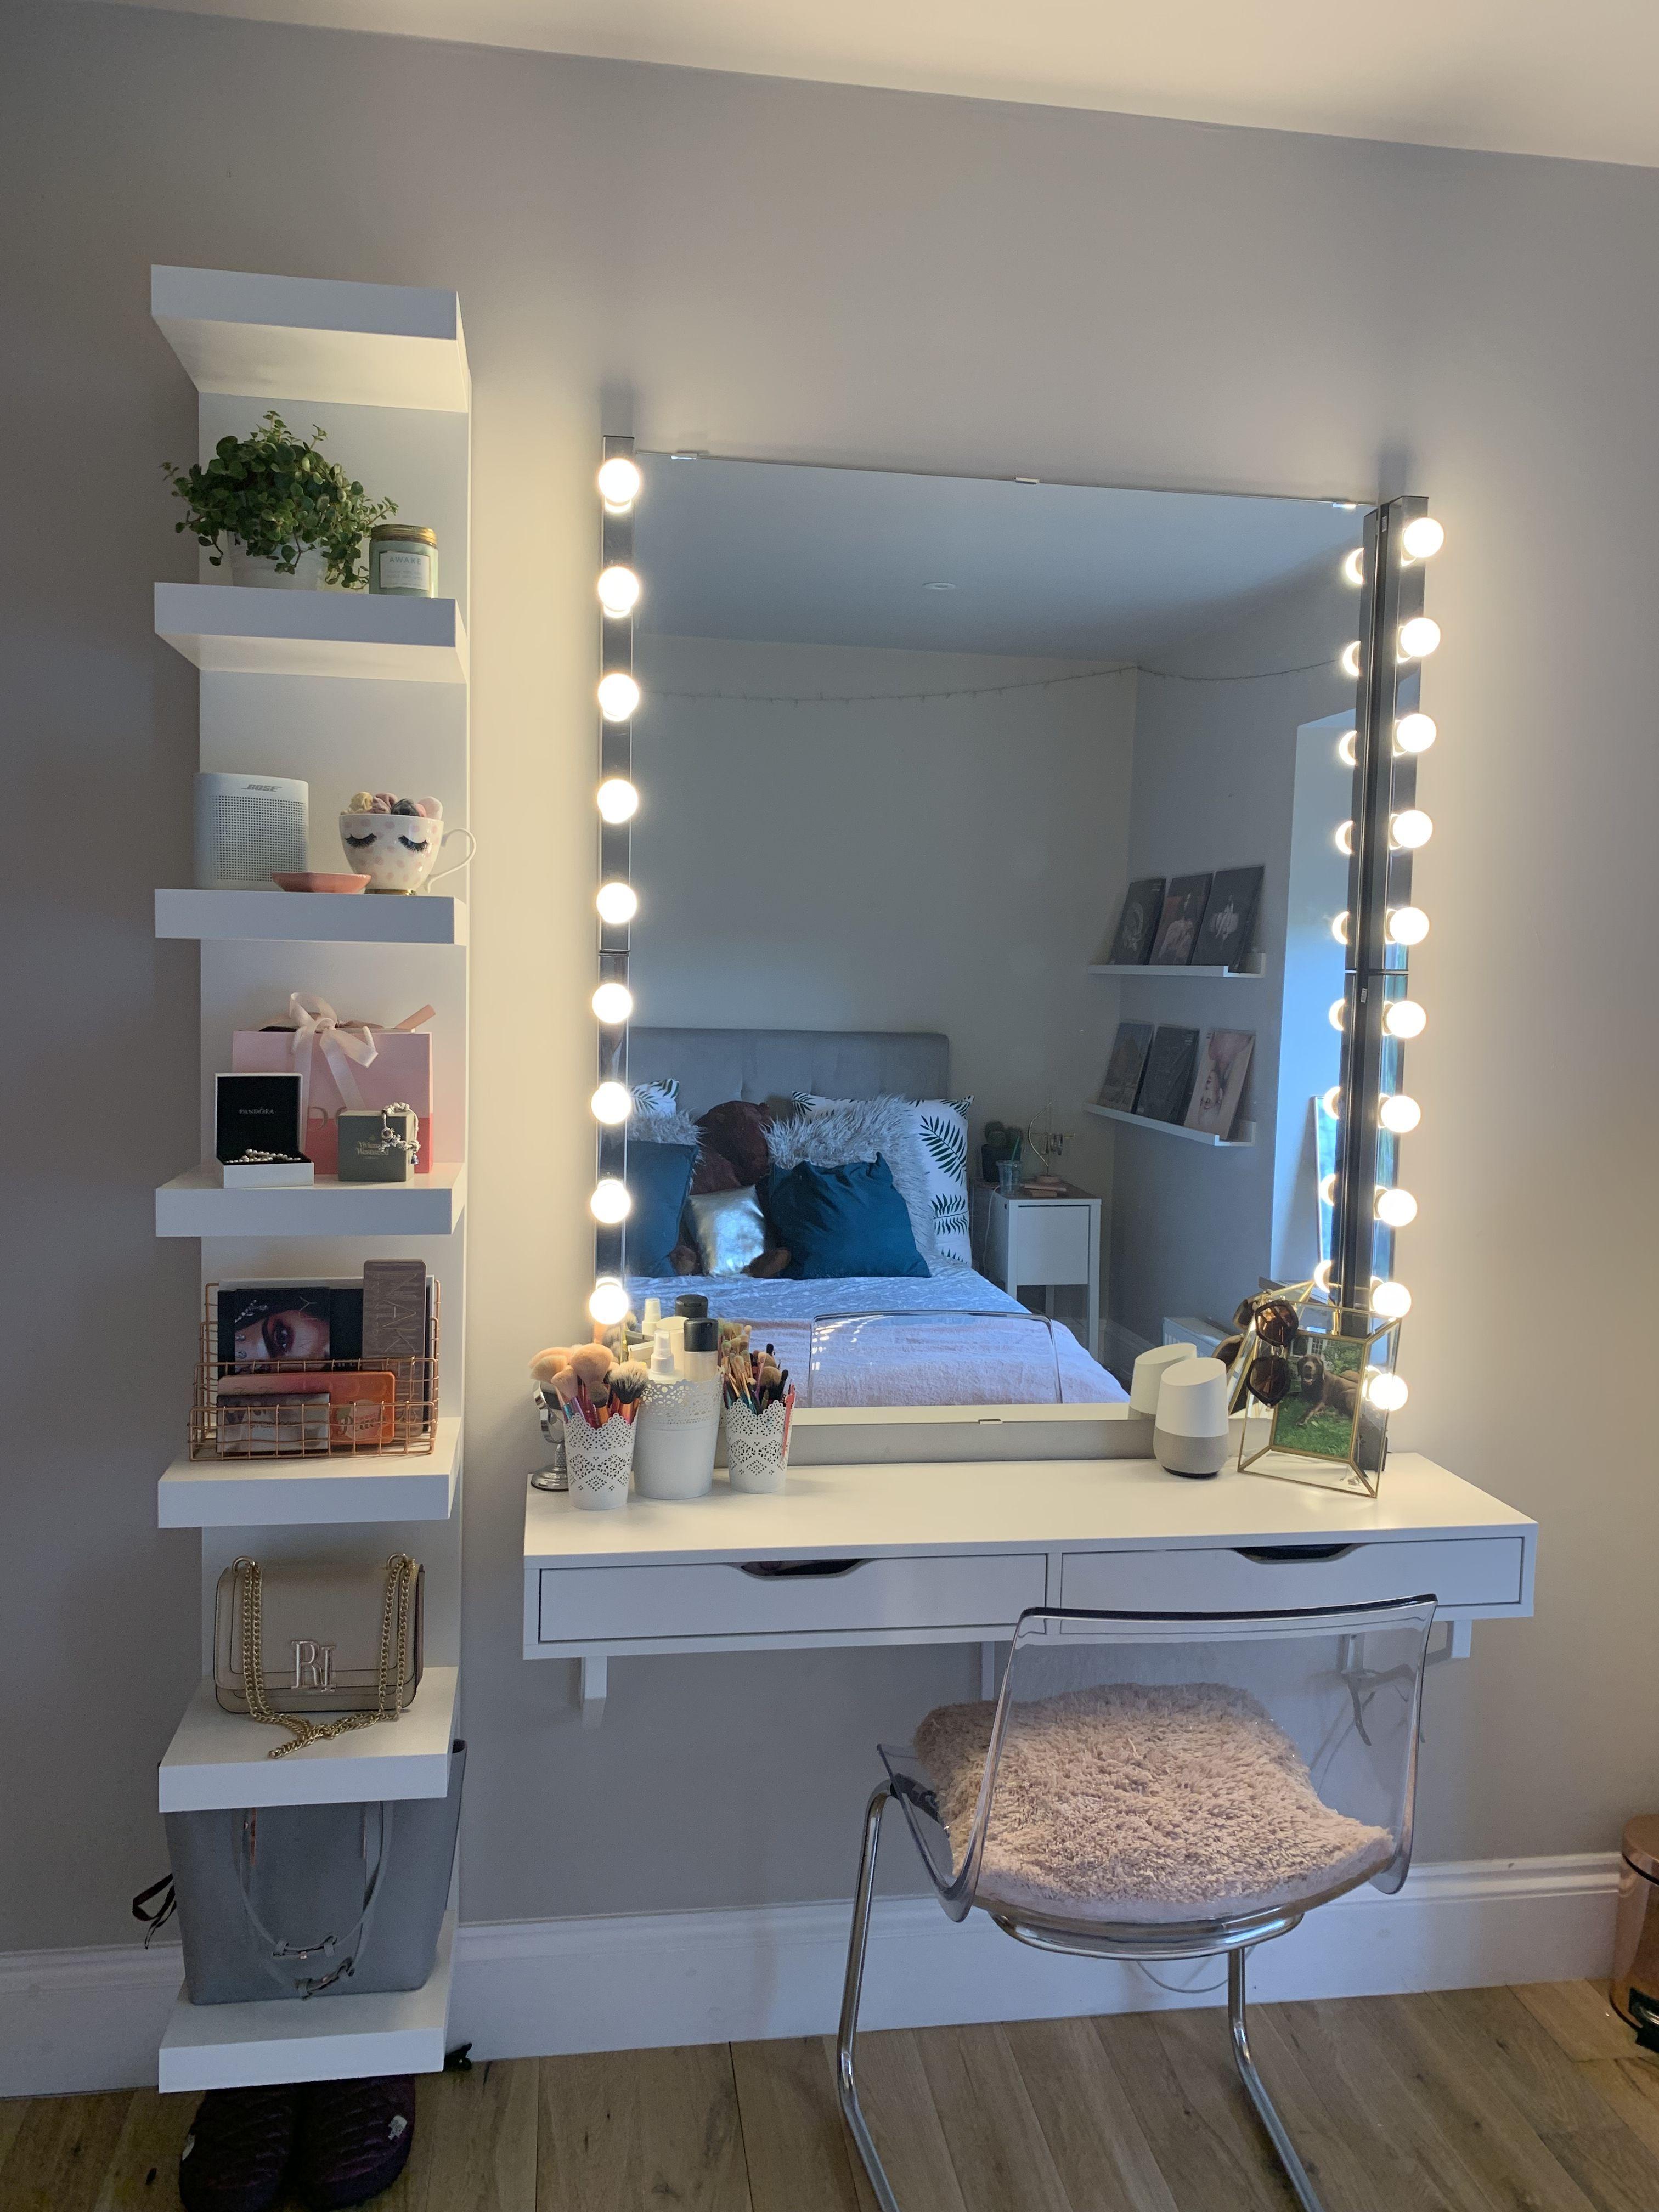 IKEA bedroom teenage girl farmhousebedroom Room design